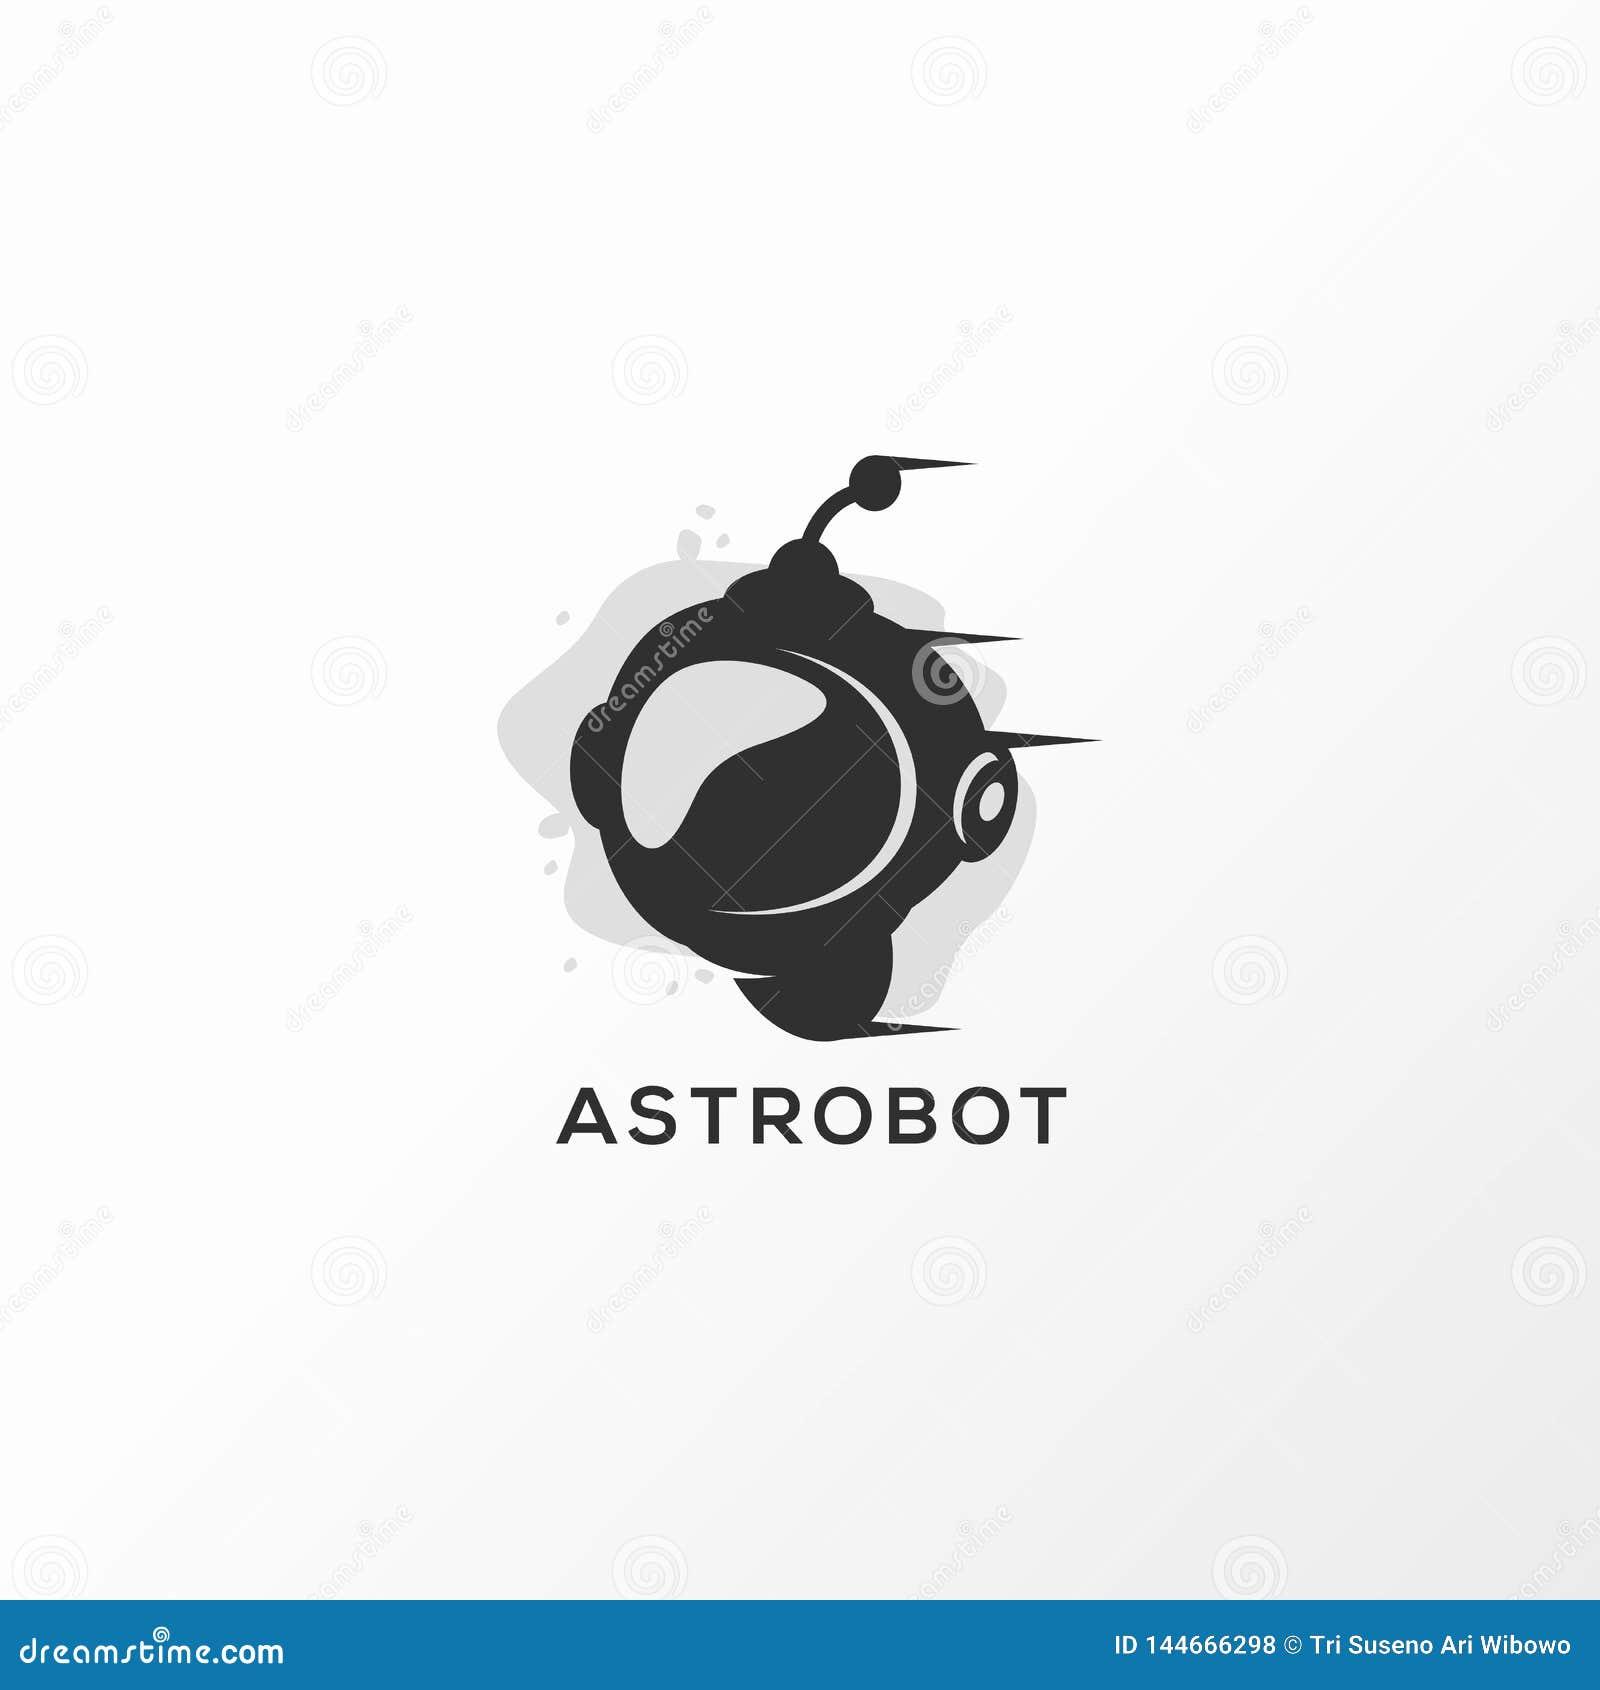 Astrobot logo design vector illustration ready to use